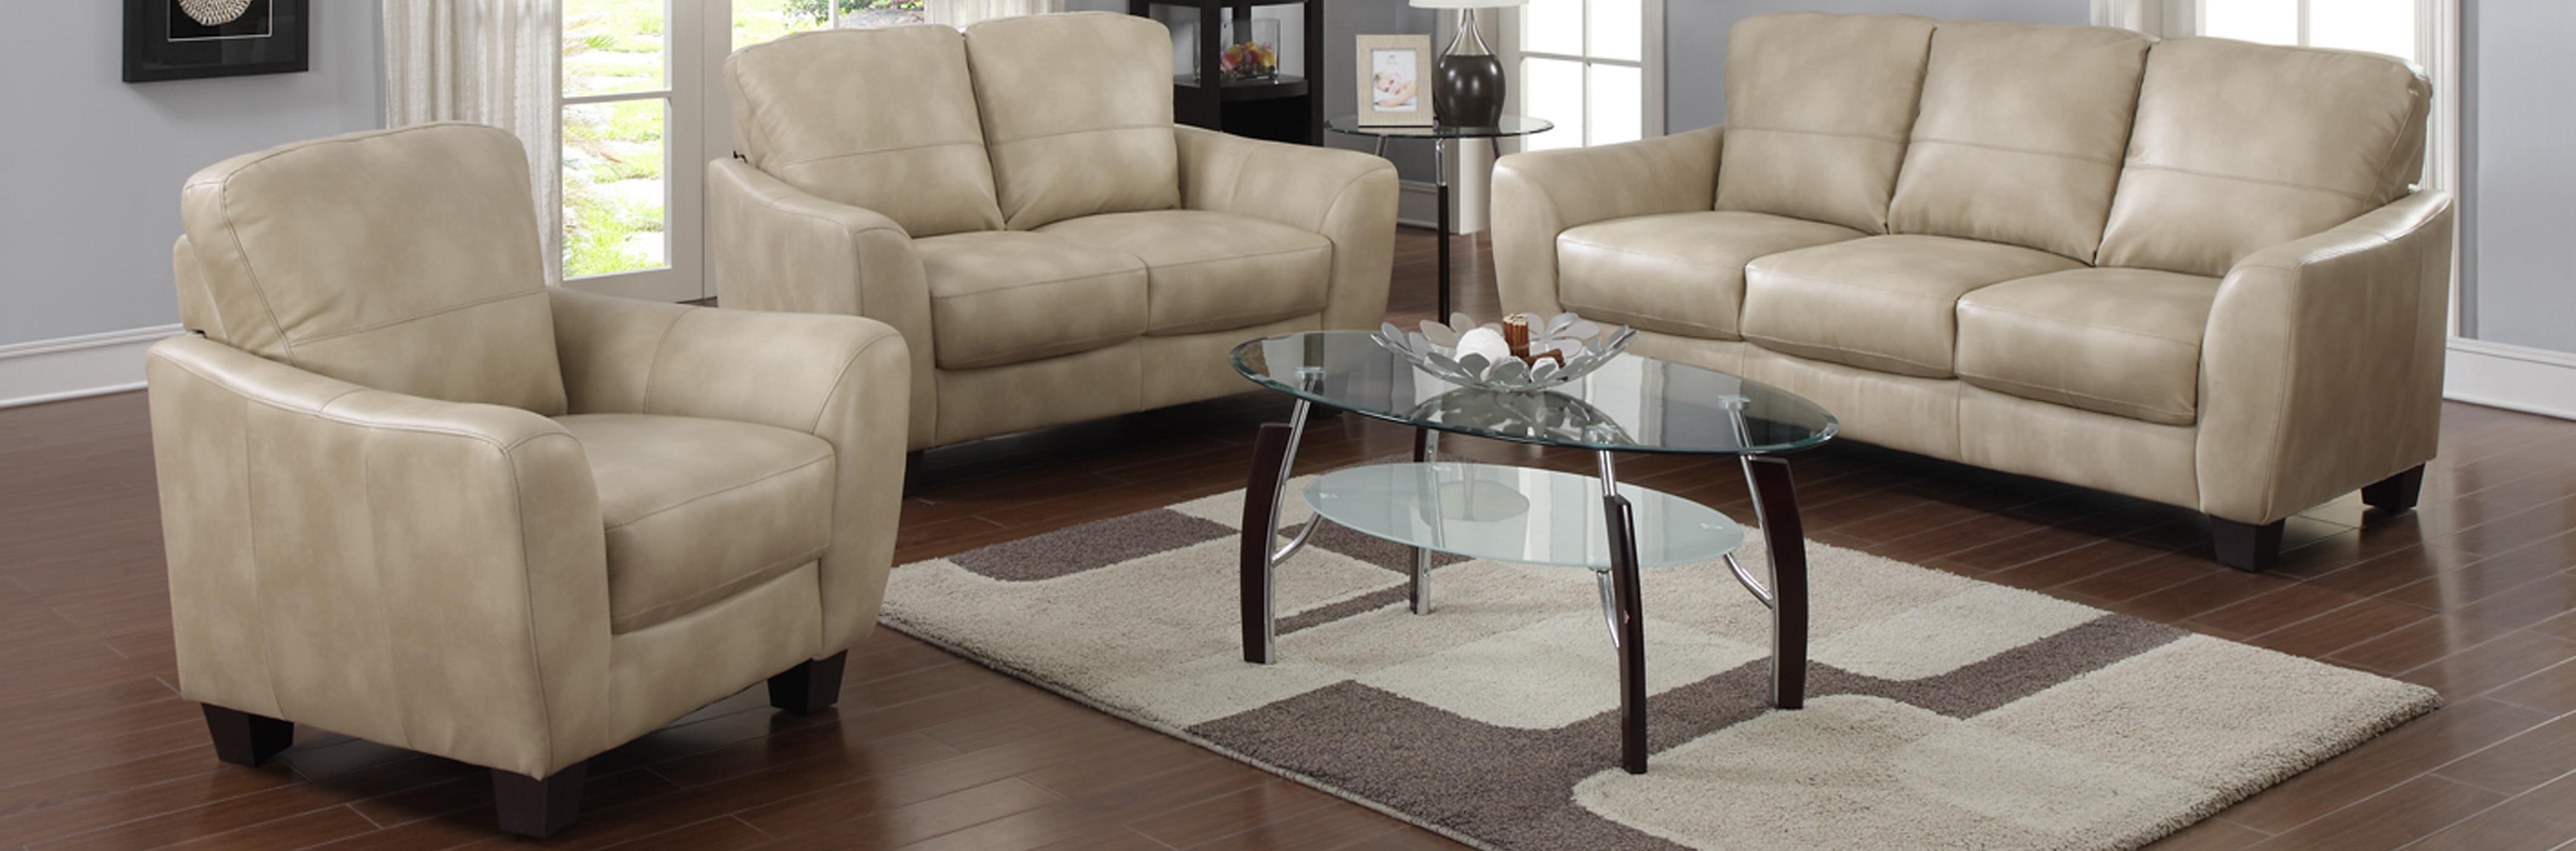 Amazon Com Milan Franklin Taupe Club Bonded Leather Sofa